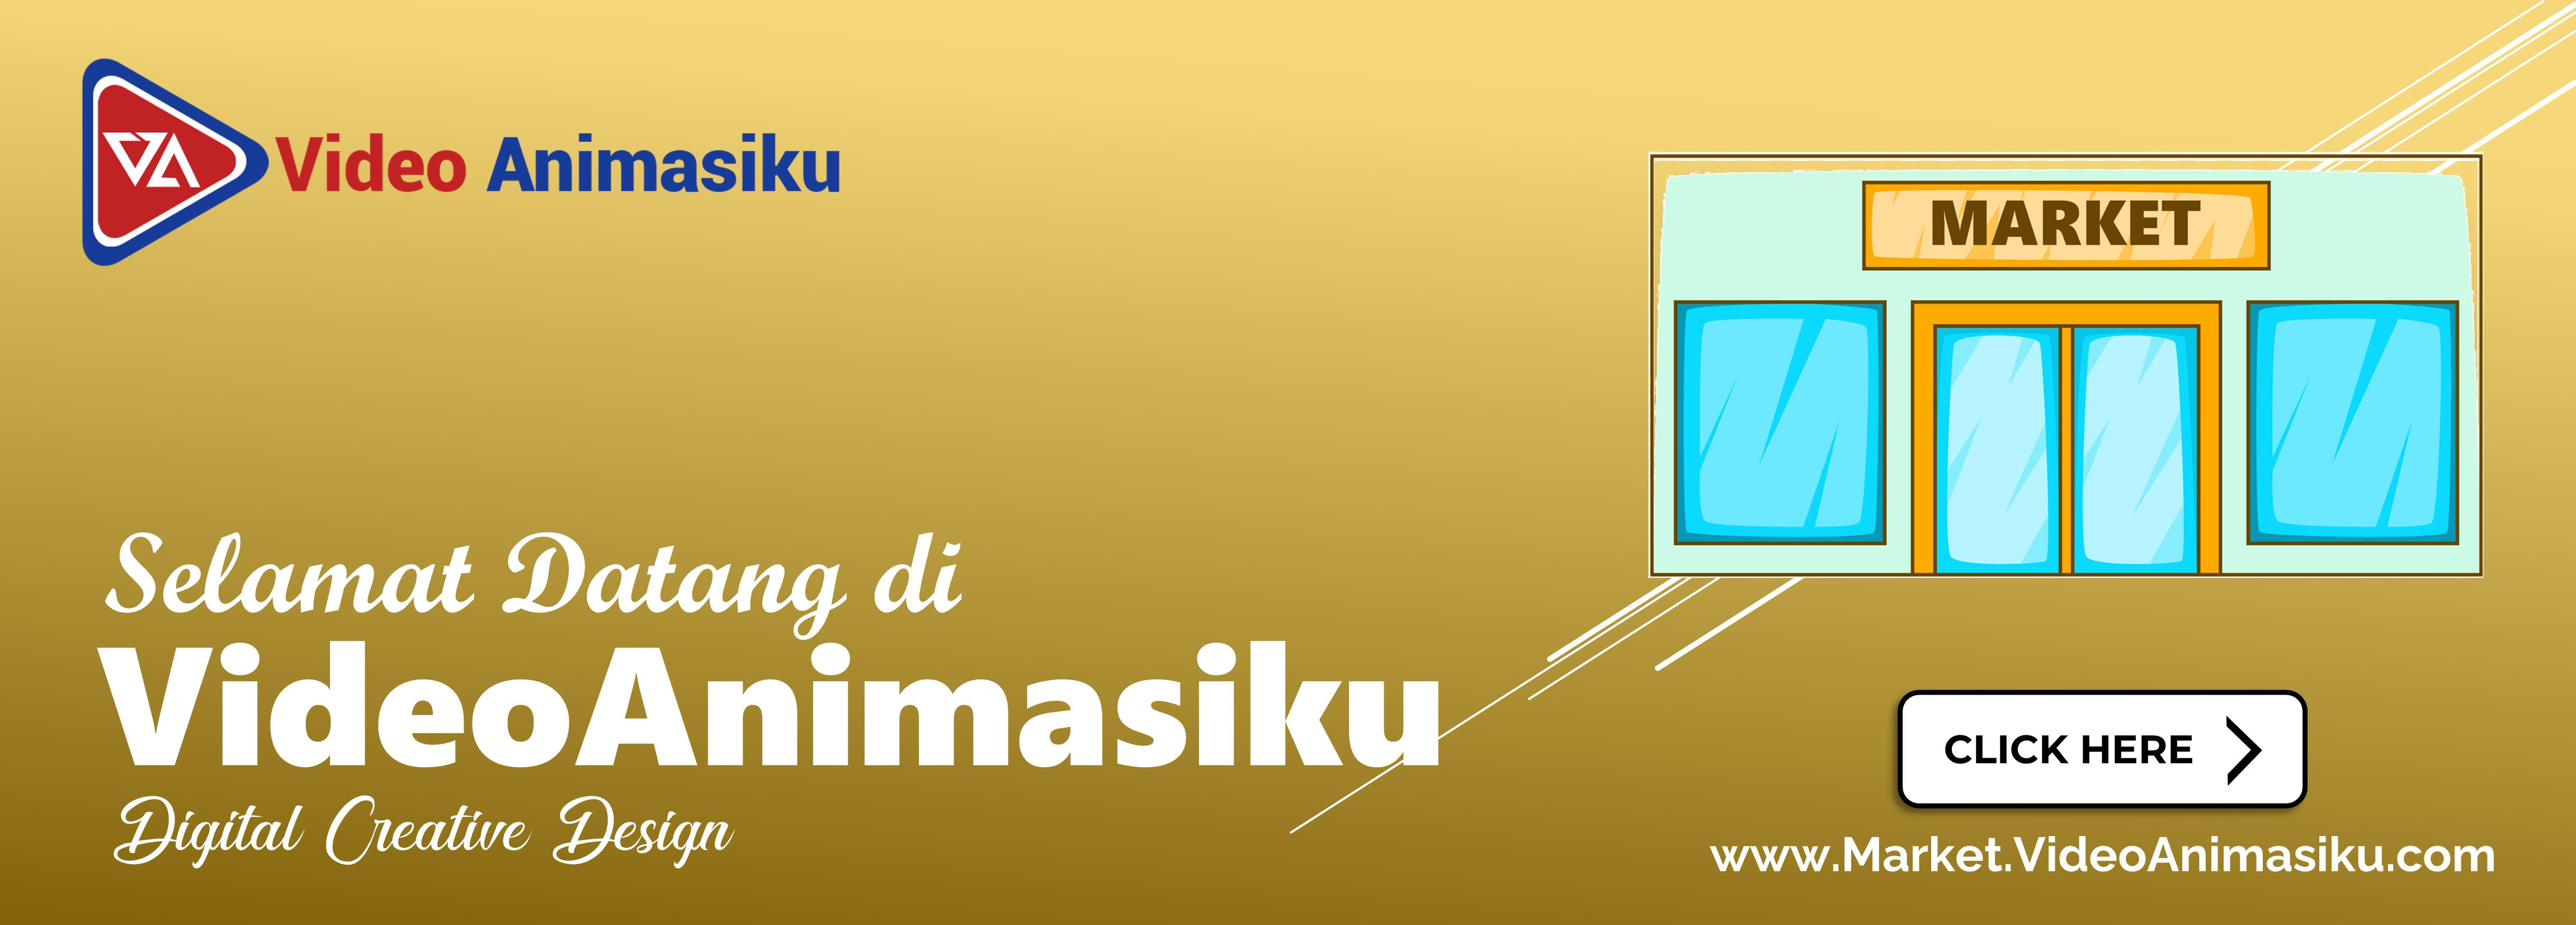 https://market.videoanimasiku.com/